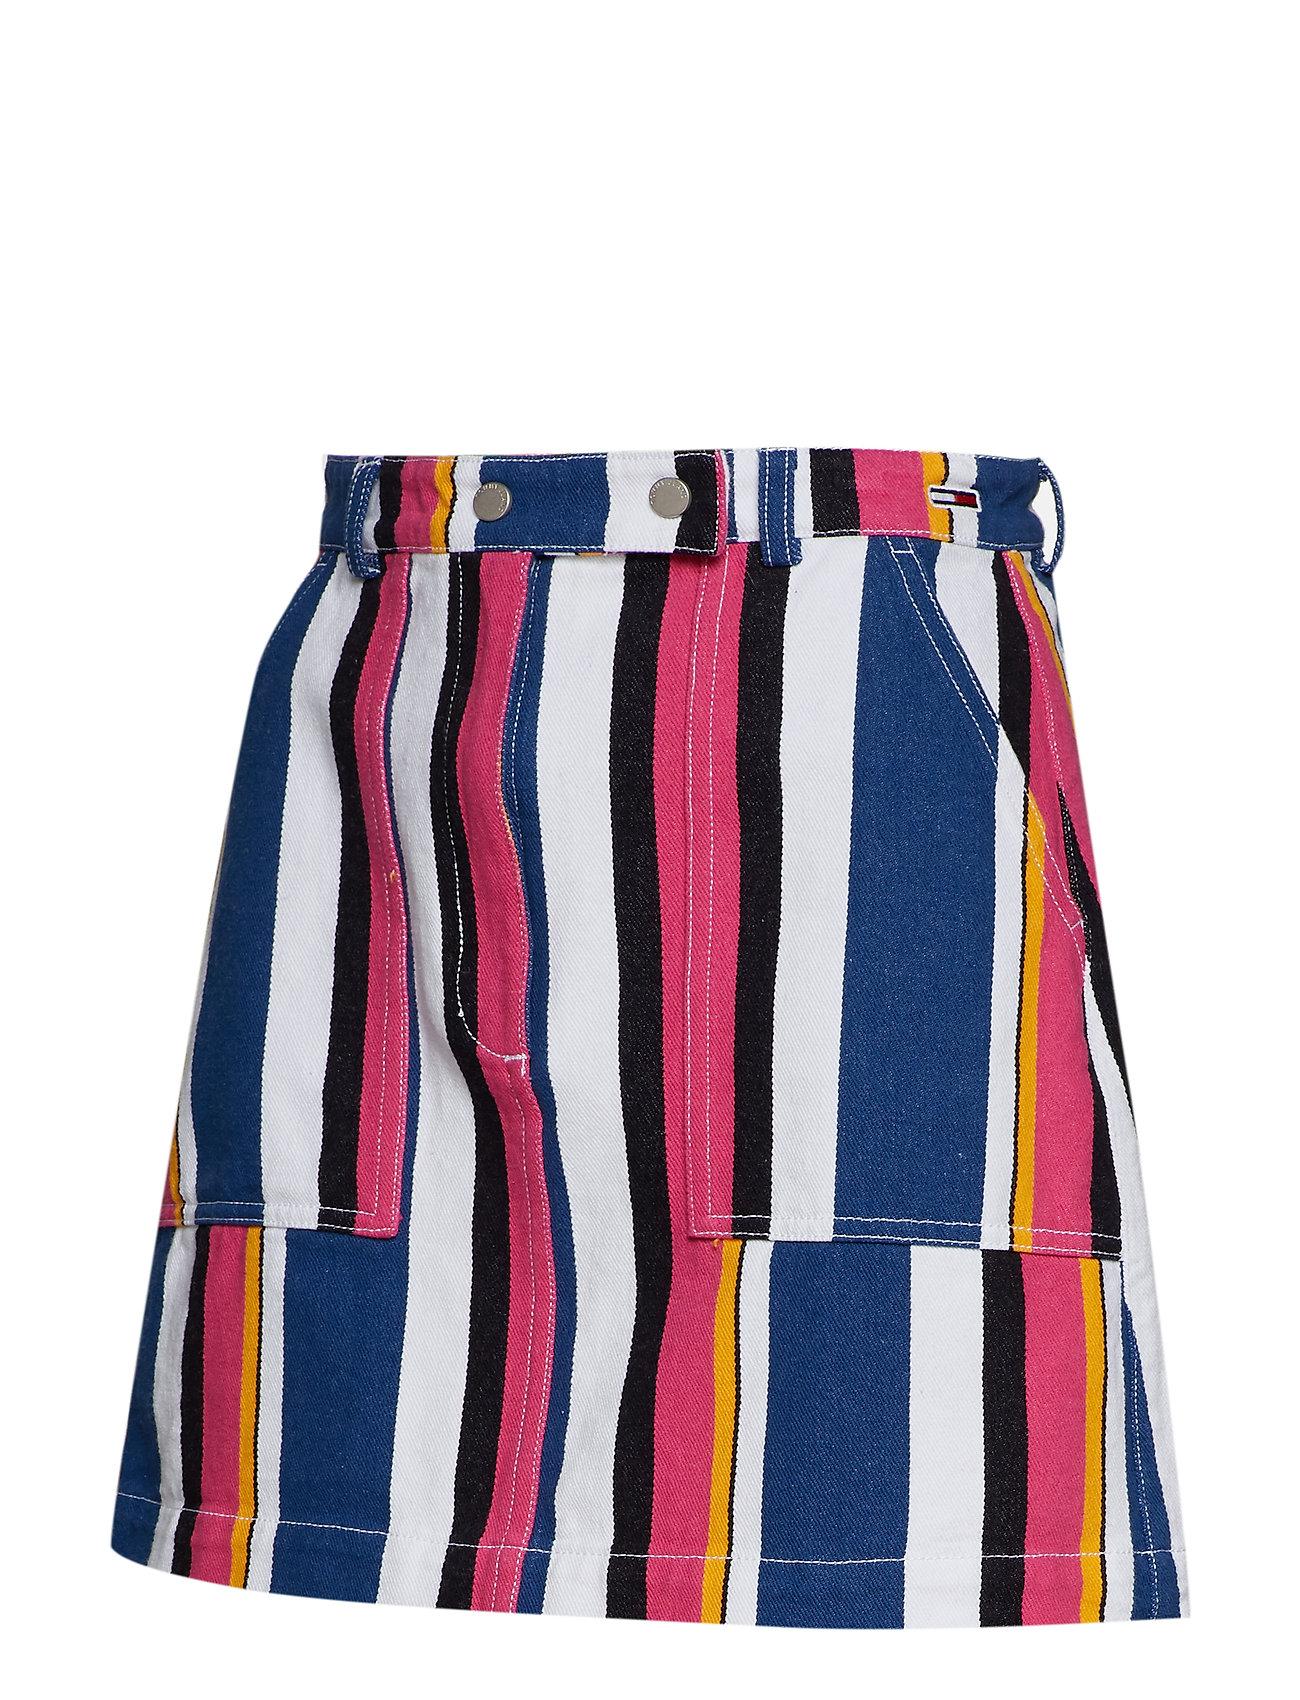 Tjw MultistripeTommy Jeans Stripe Skirtbold Carpenter nX80OwPk